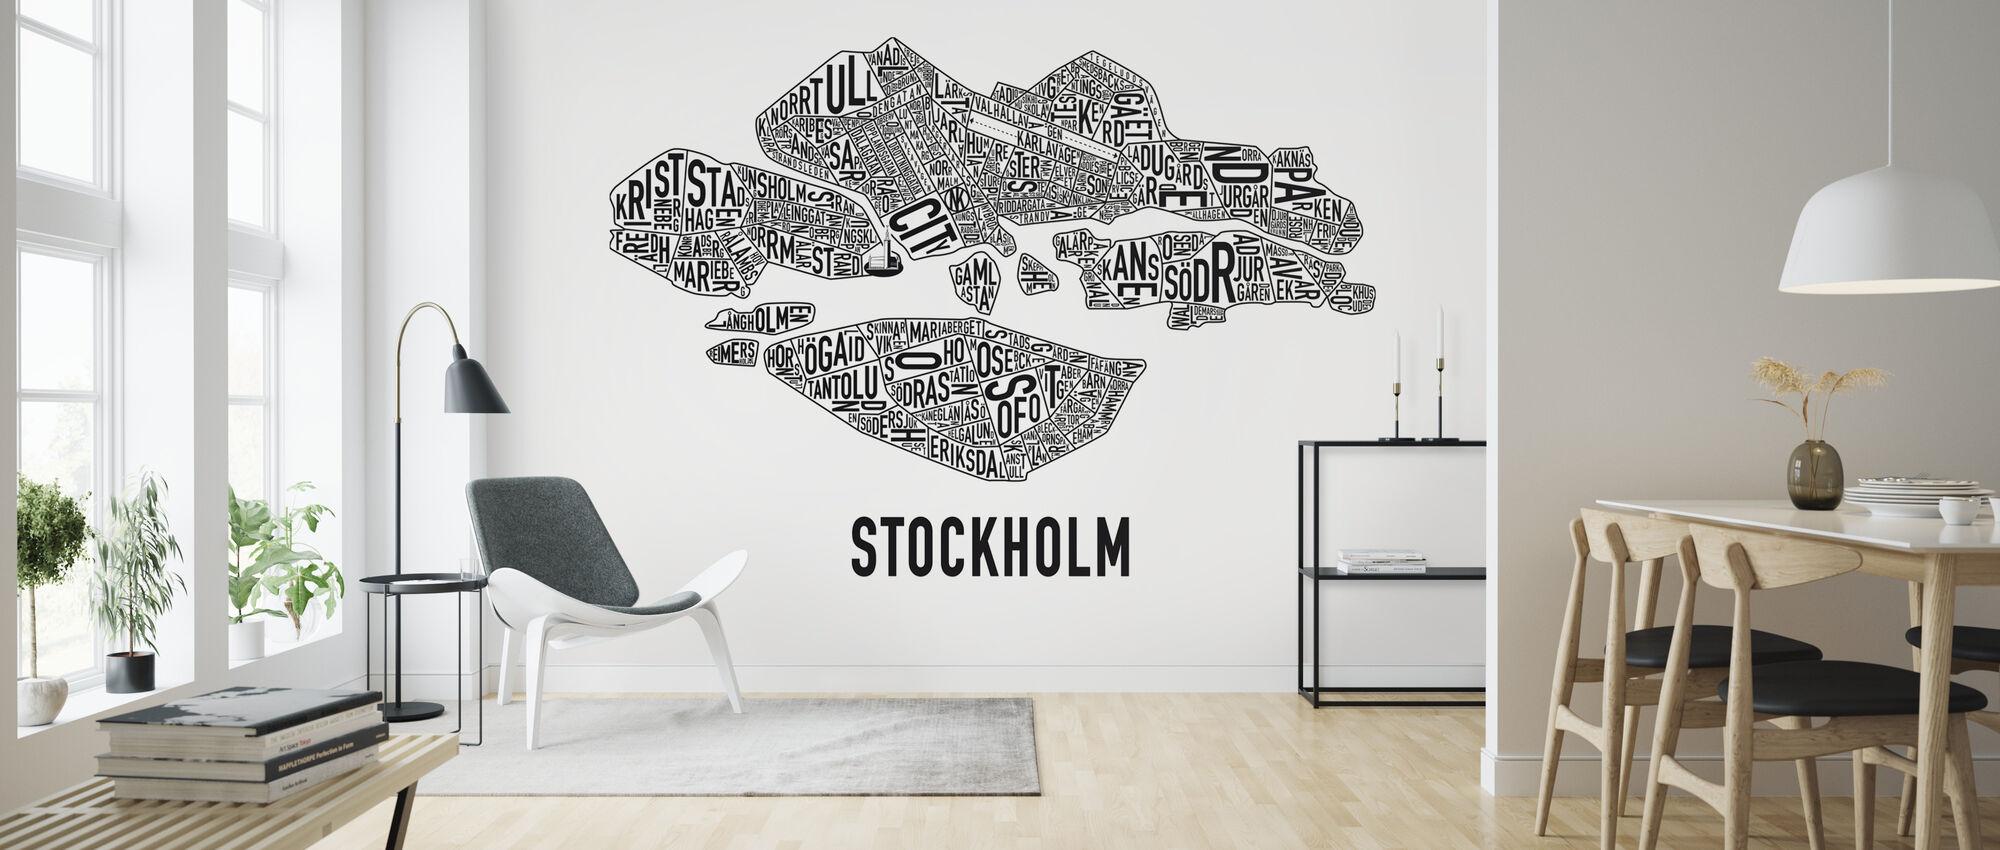 Stockholm - Wallpaper - Living Room